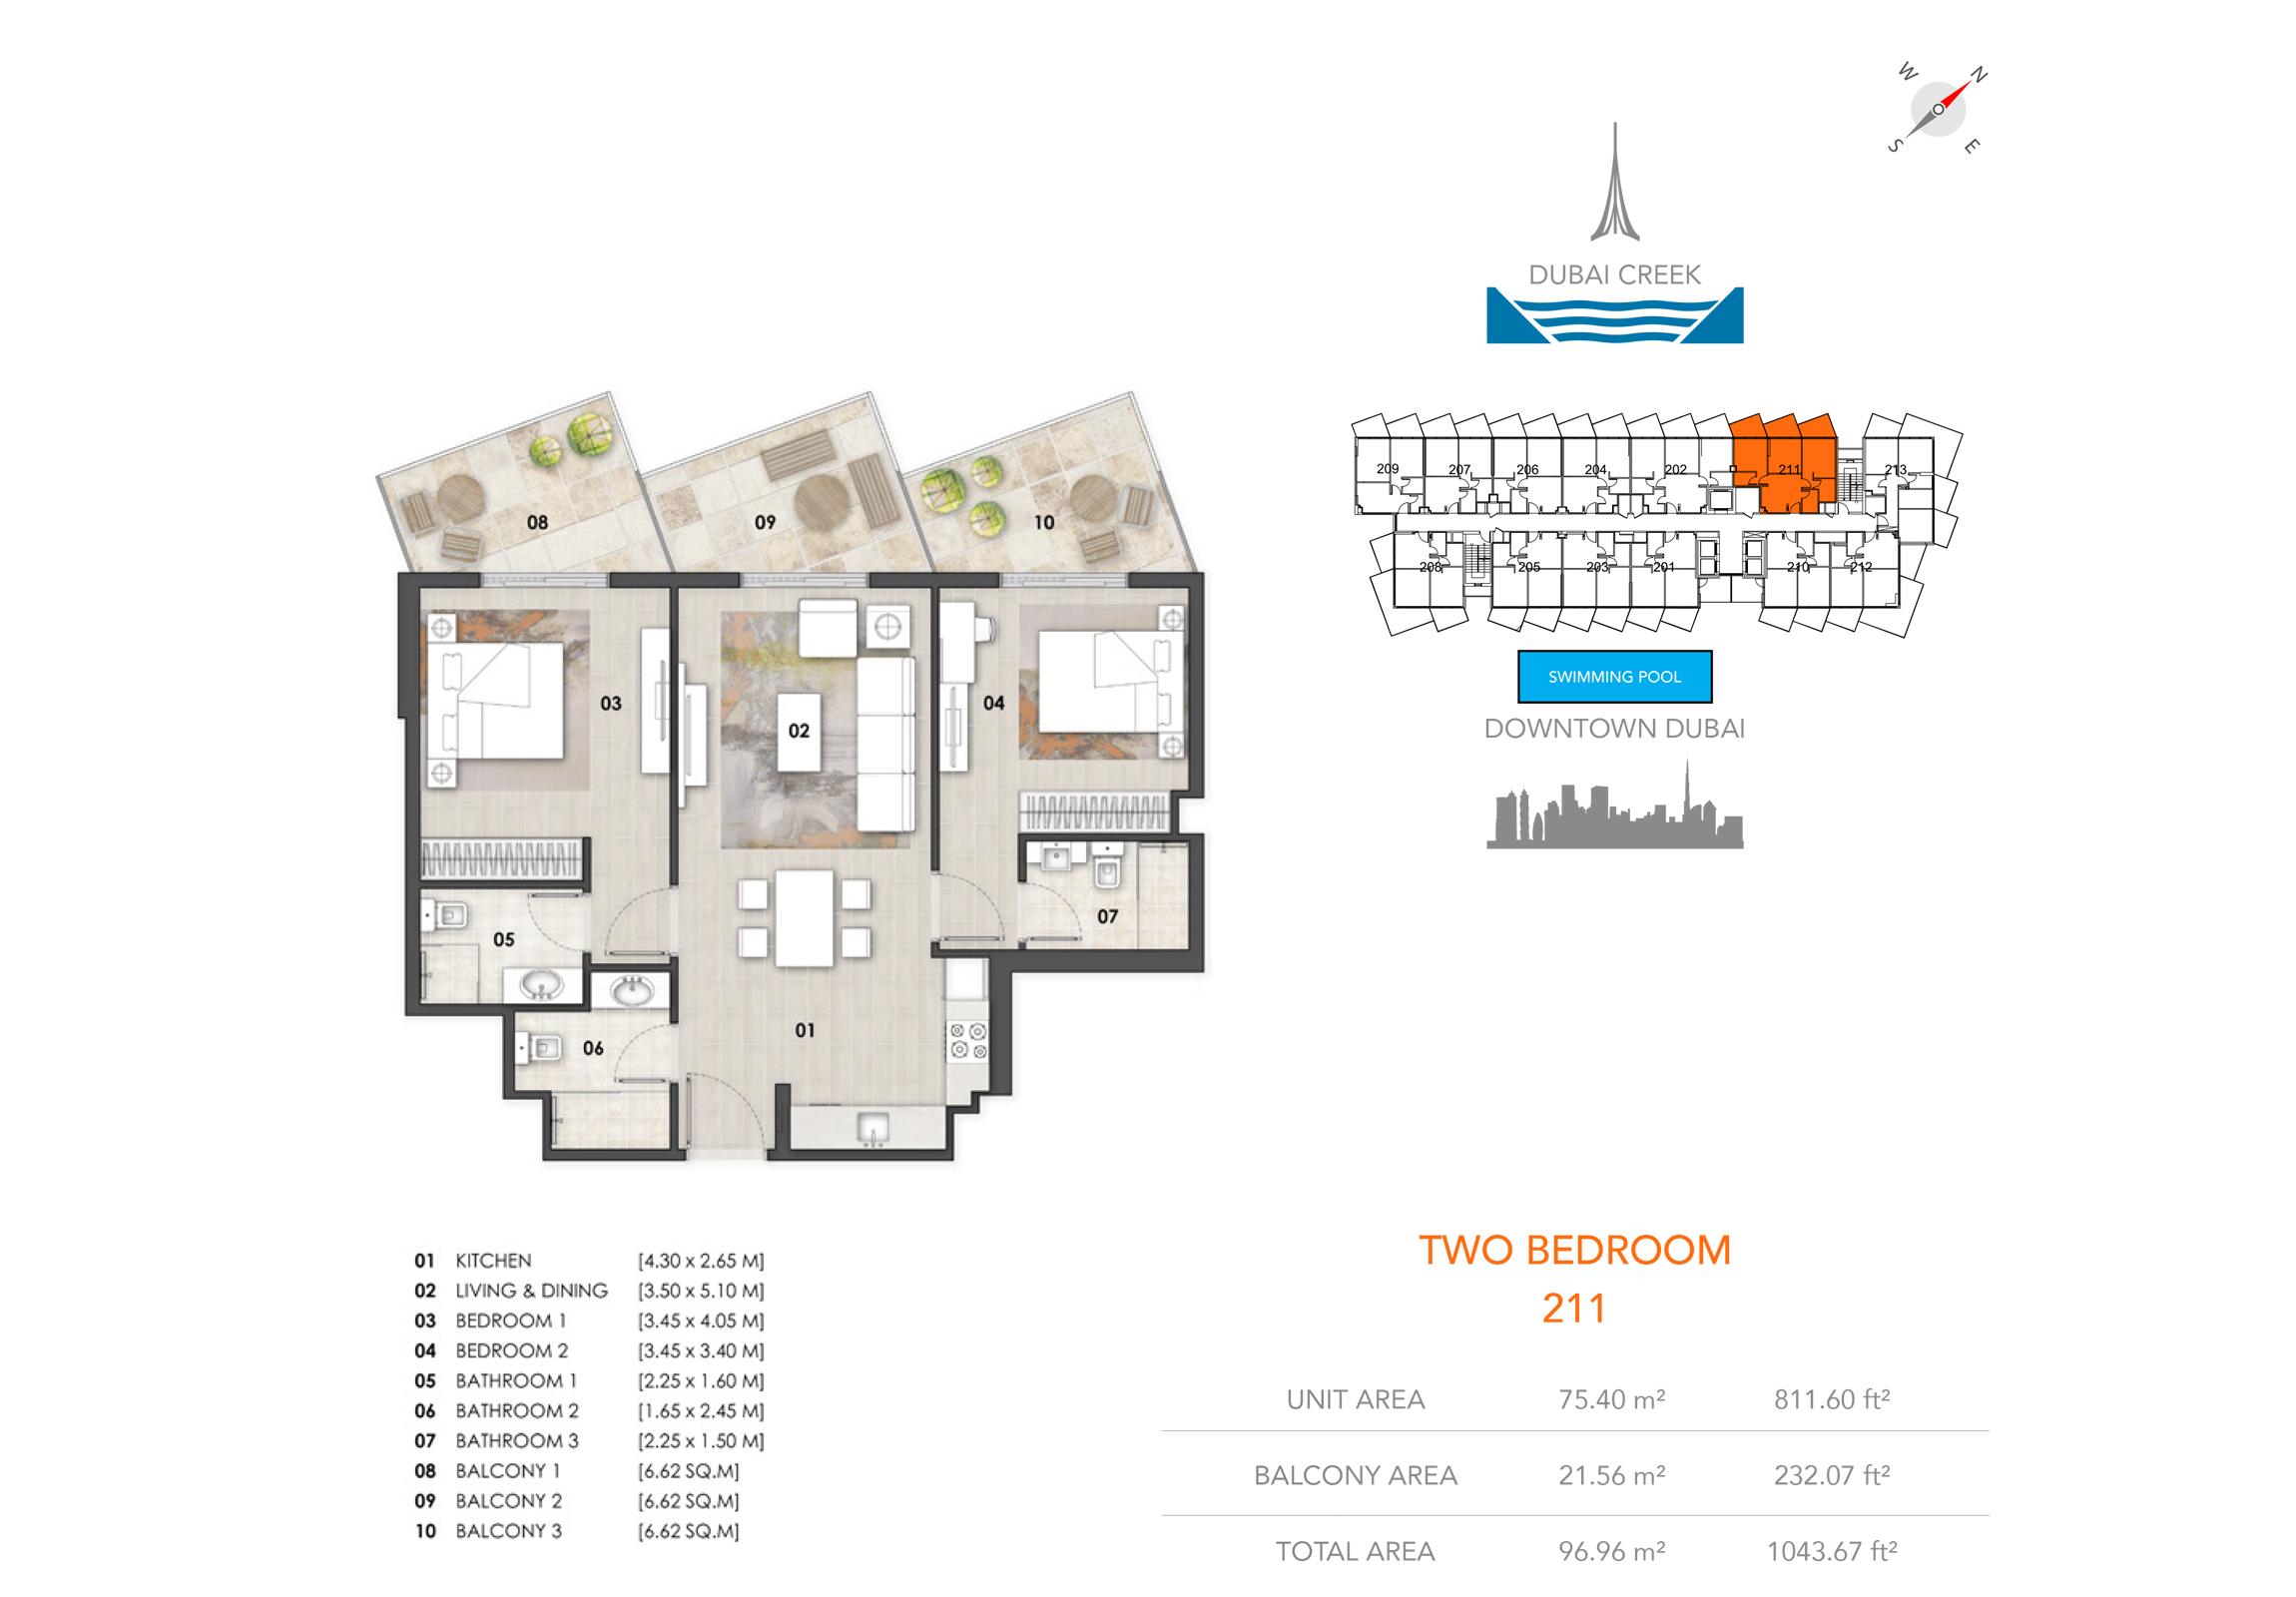 2 Bedroom 211, Size 1043.67  sq. ft.